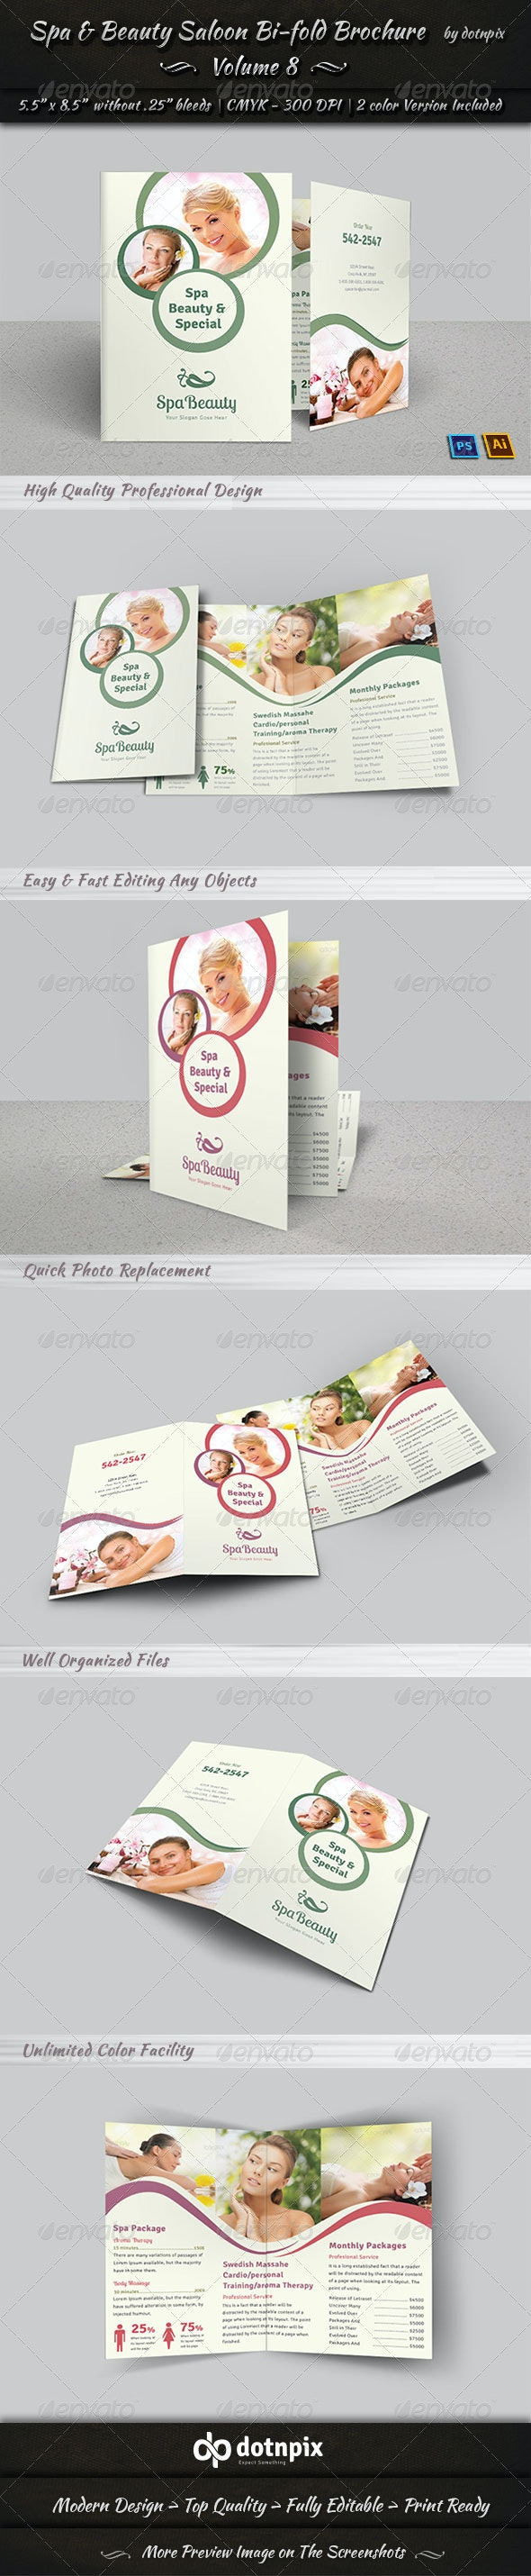 Spa & Beauty Saloon Bi-fold Brochure   Volume 8 - Corporate Brochures